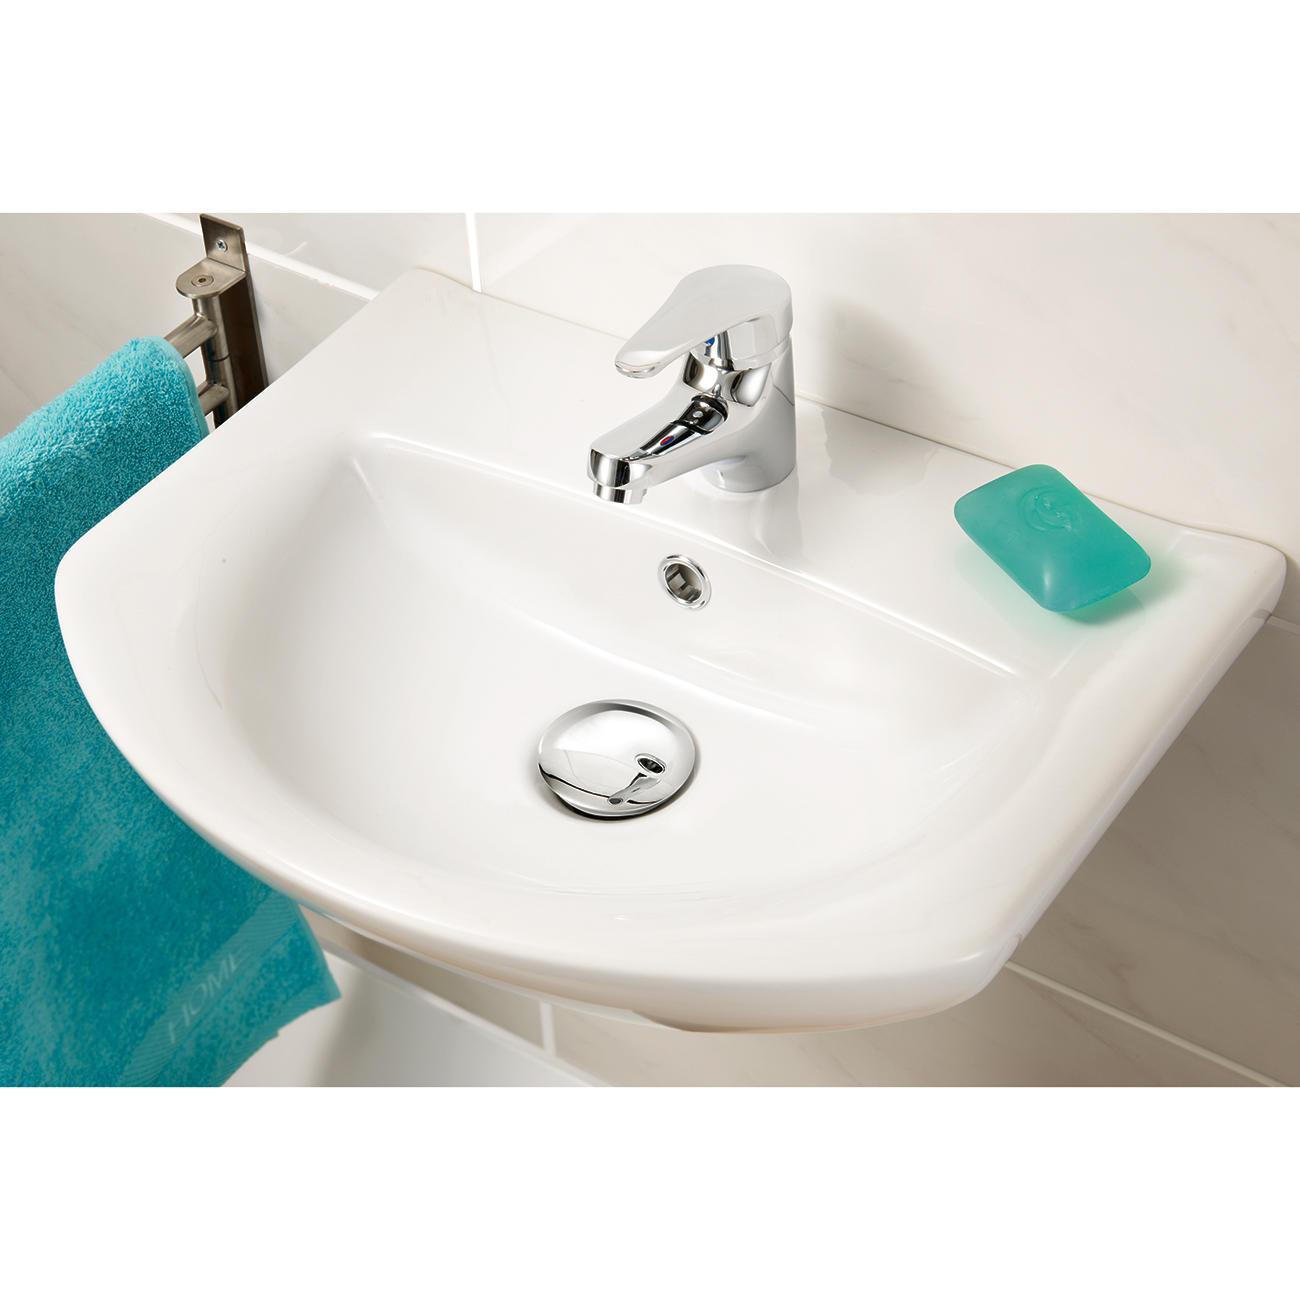 waschbecken verschluss stpsel waschbecken abfluss stopfen. Black Bedroom Furniture Sets. Home Design Ideas